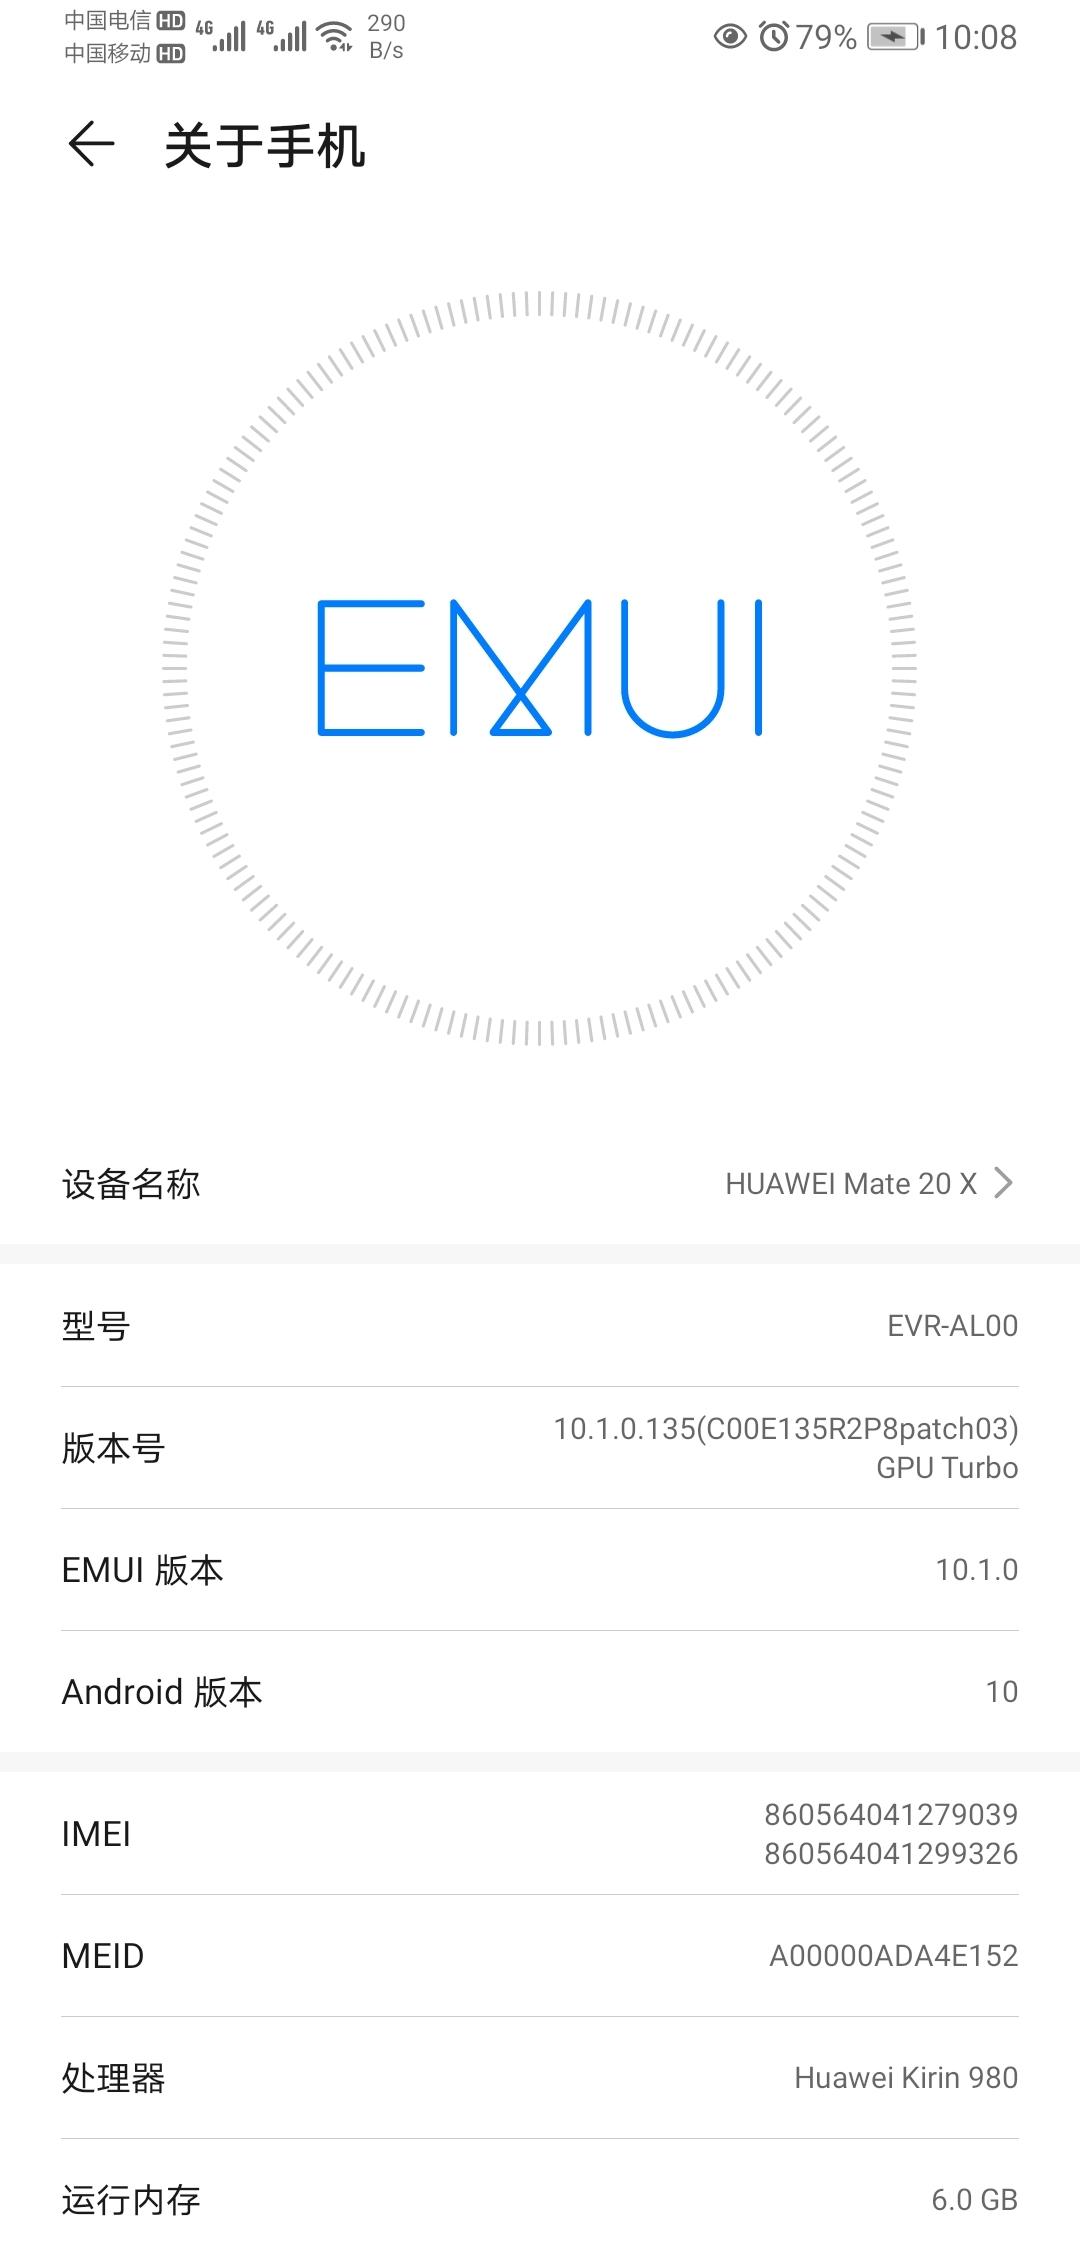 Screenshot_20200515_100819_com.android.settings.jpg